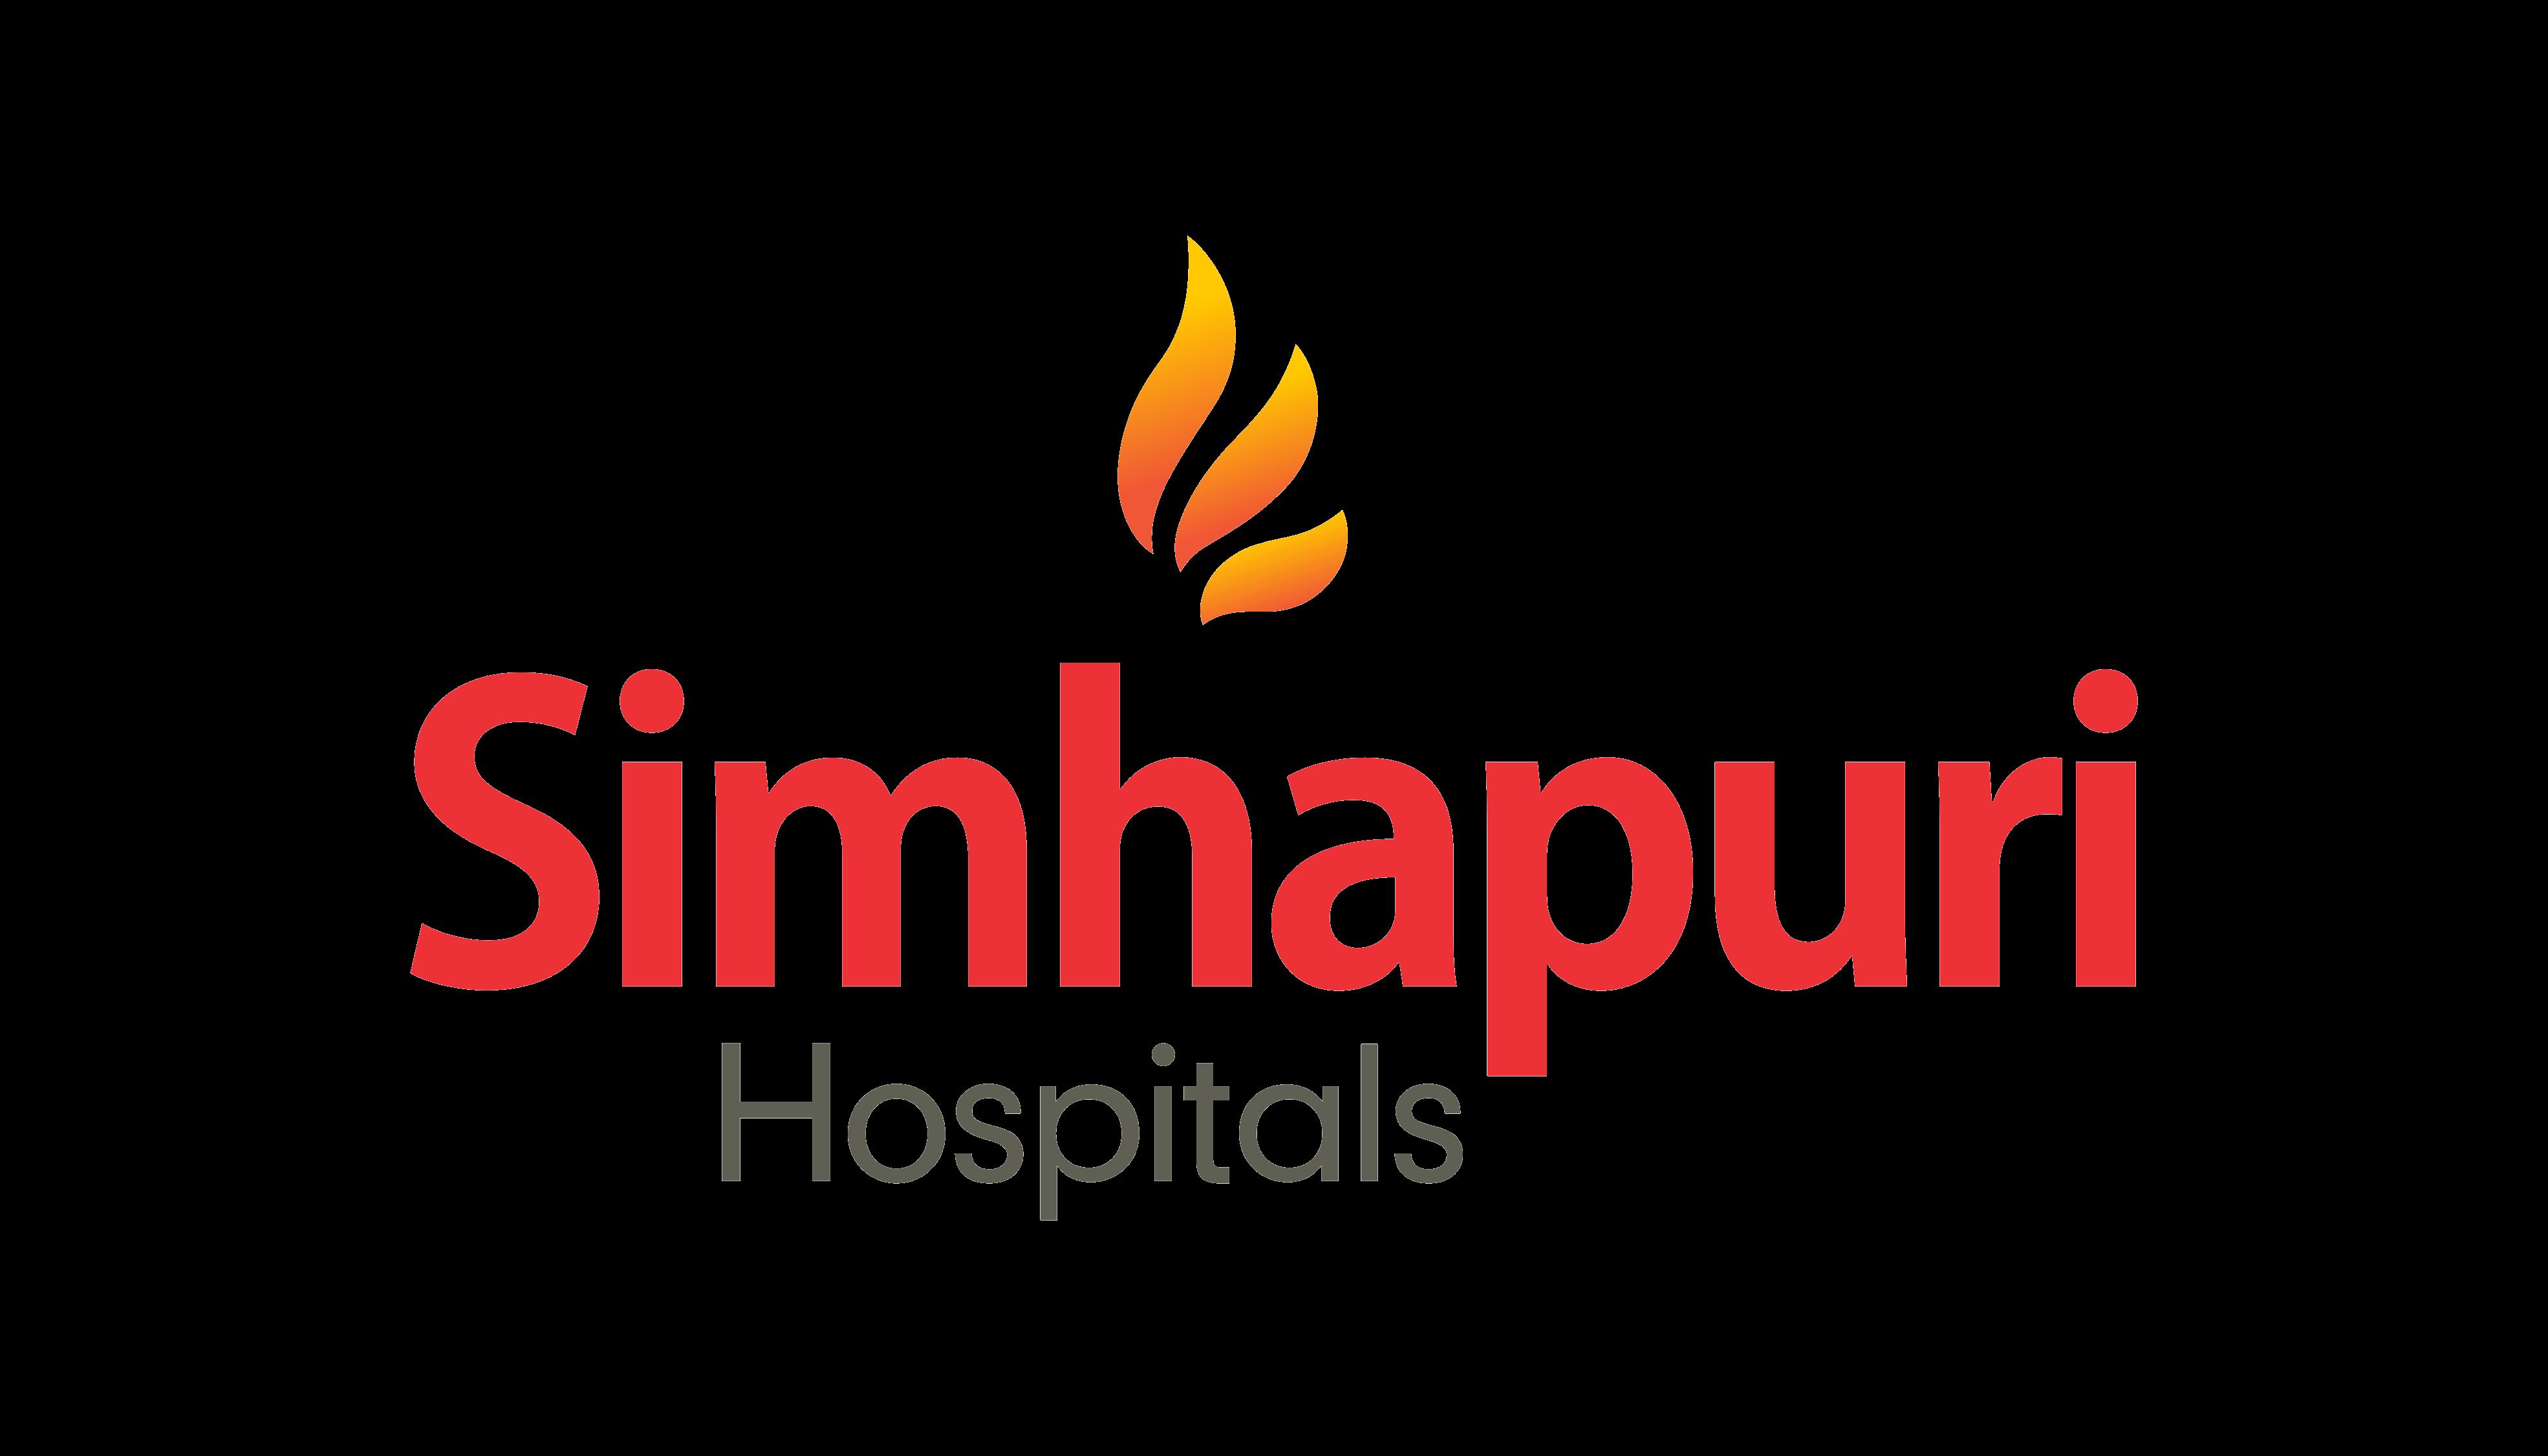 Simhapuri Hospital - Nellore Image